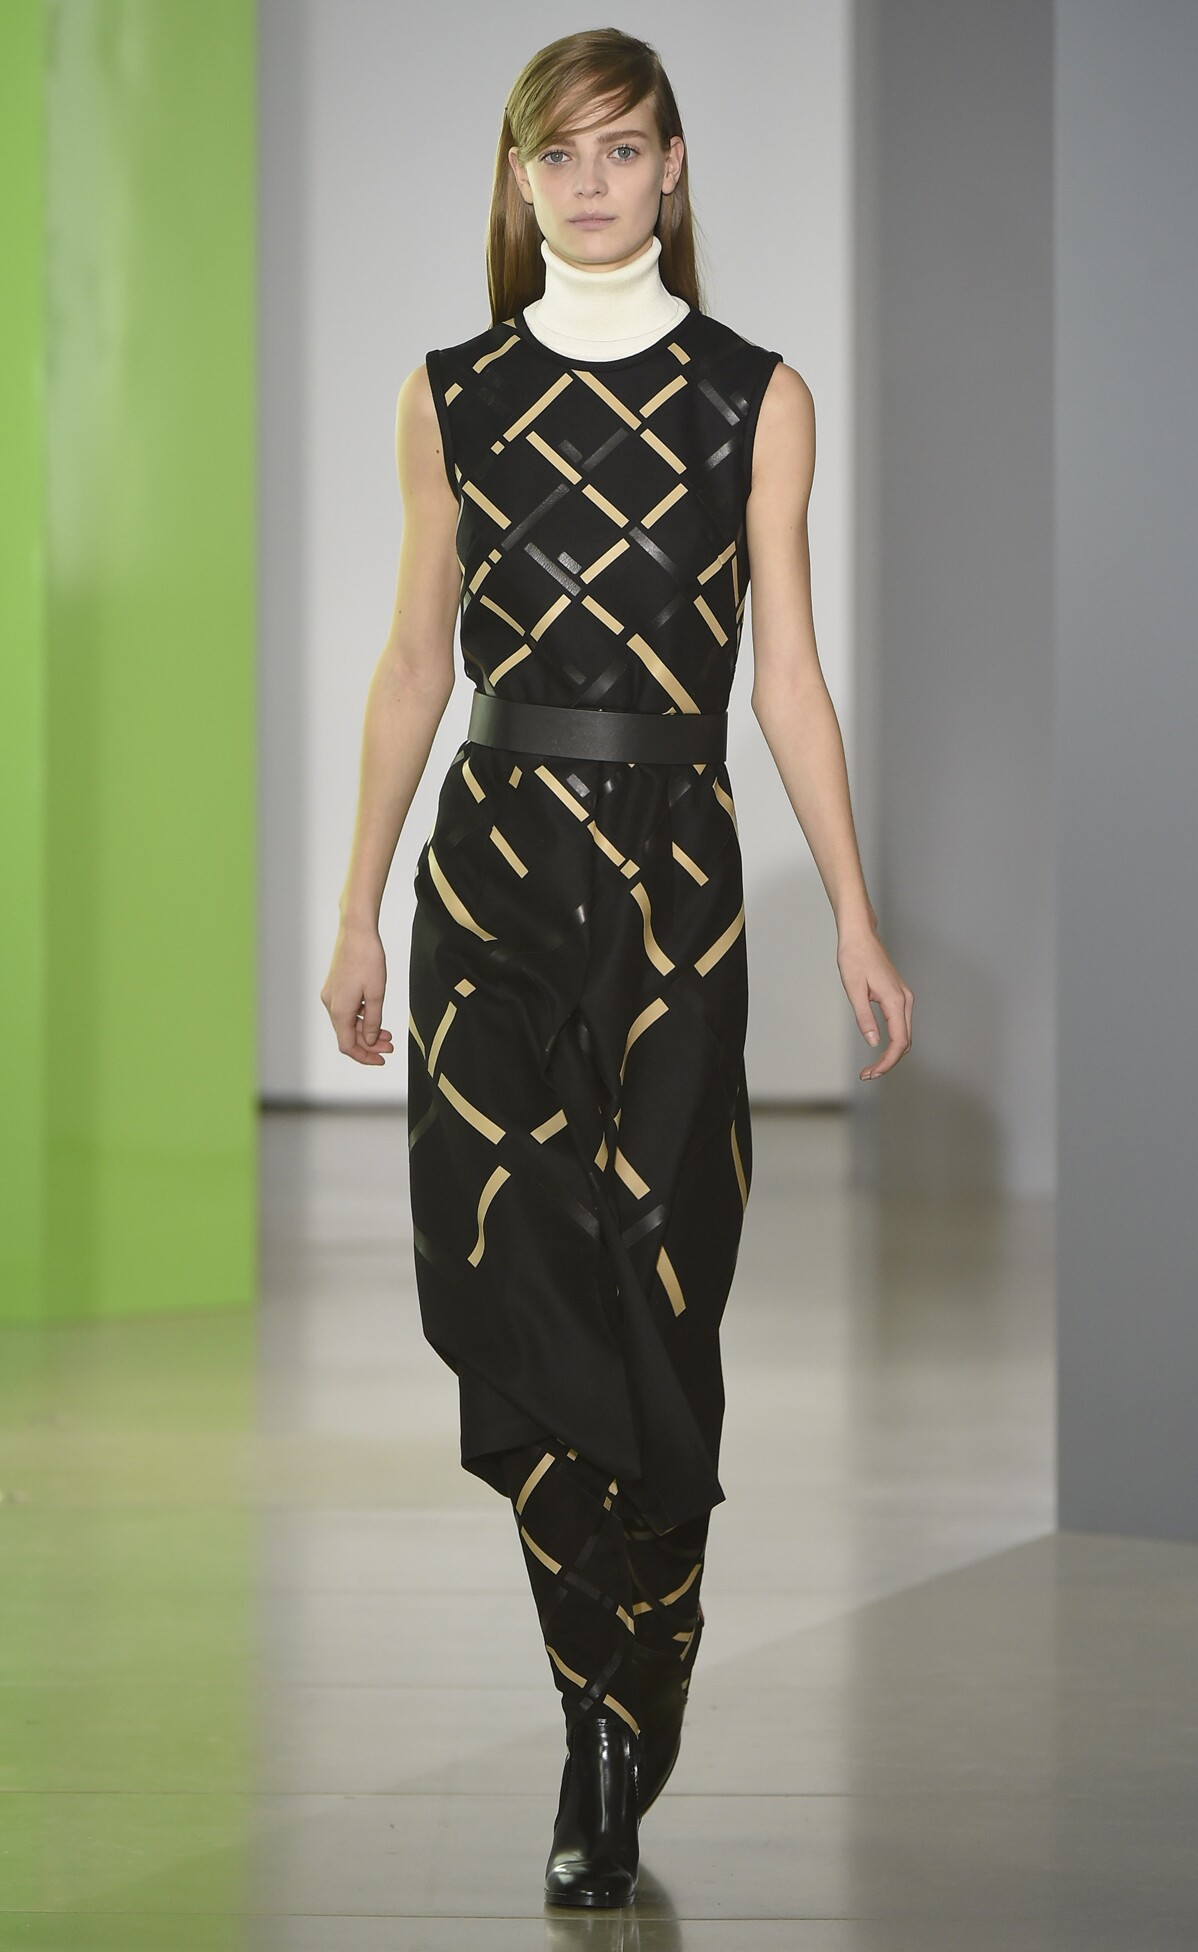 Catwalk Jil Sander Fall Winter 2015 16 Women's Collection Milan Fashion Week